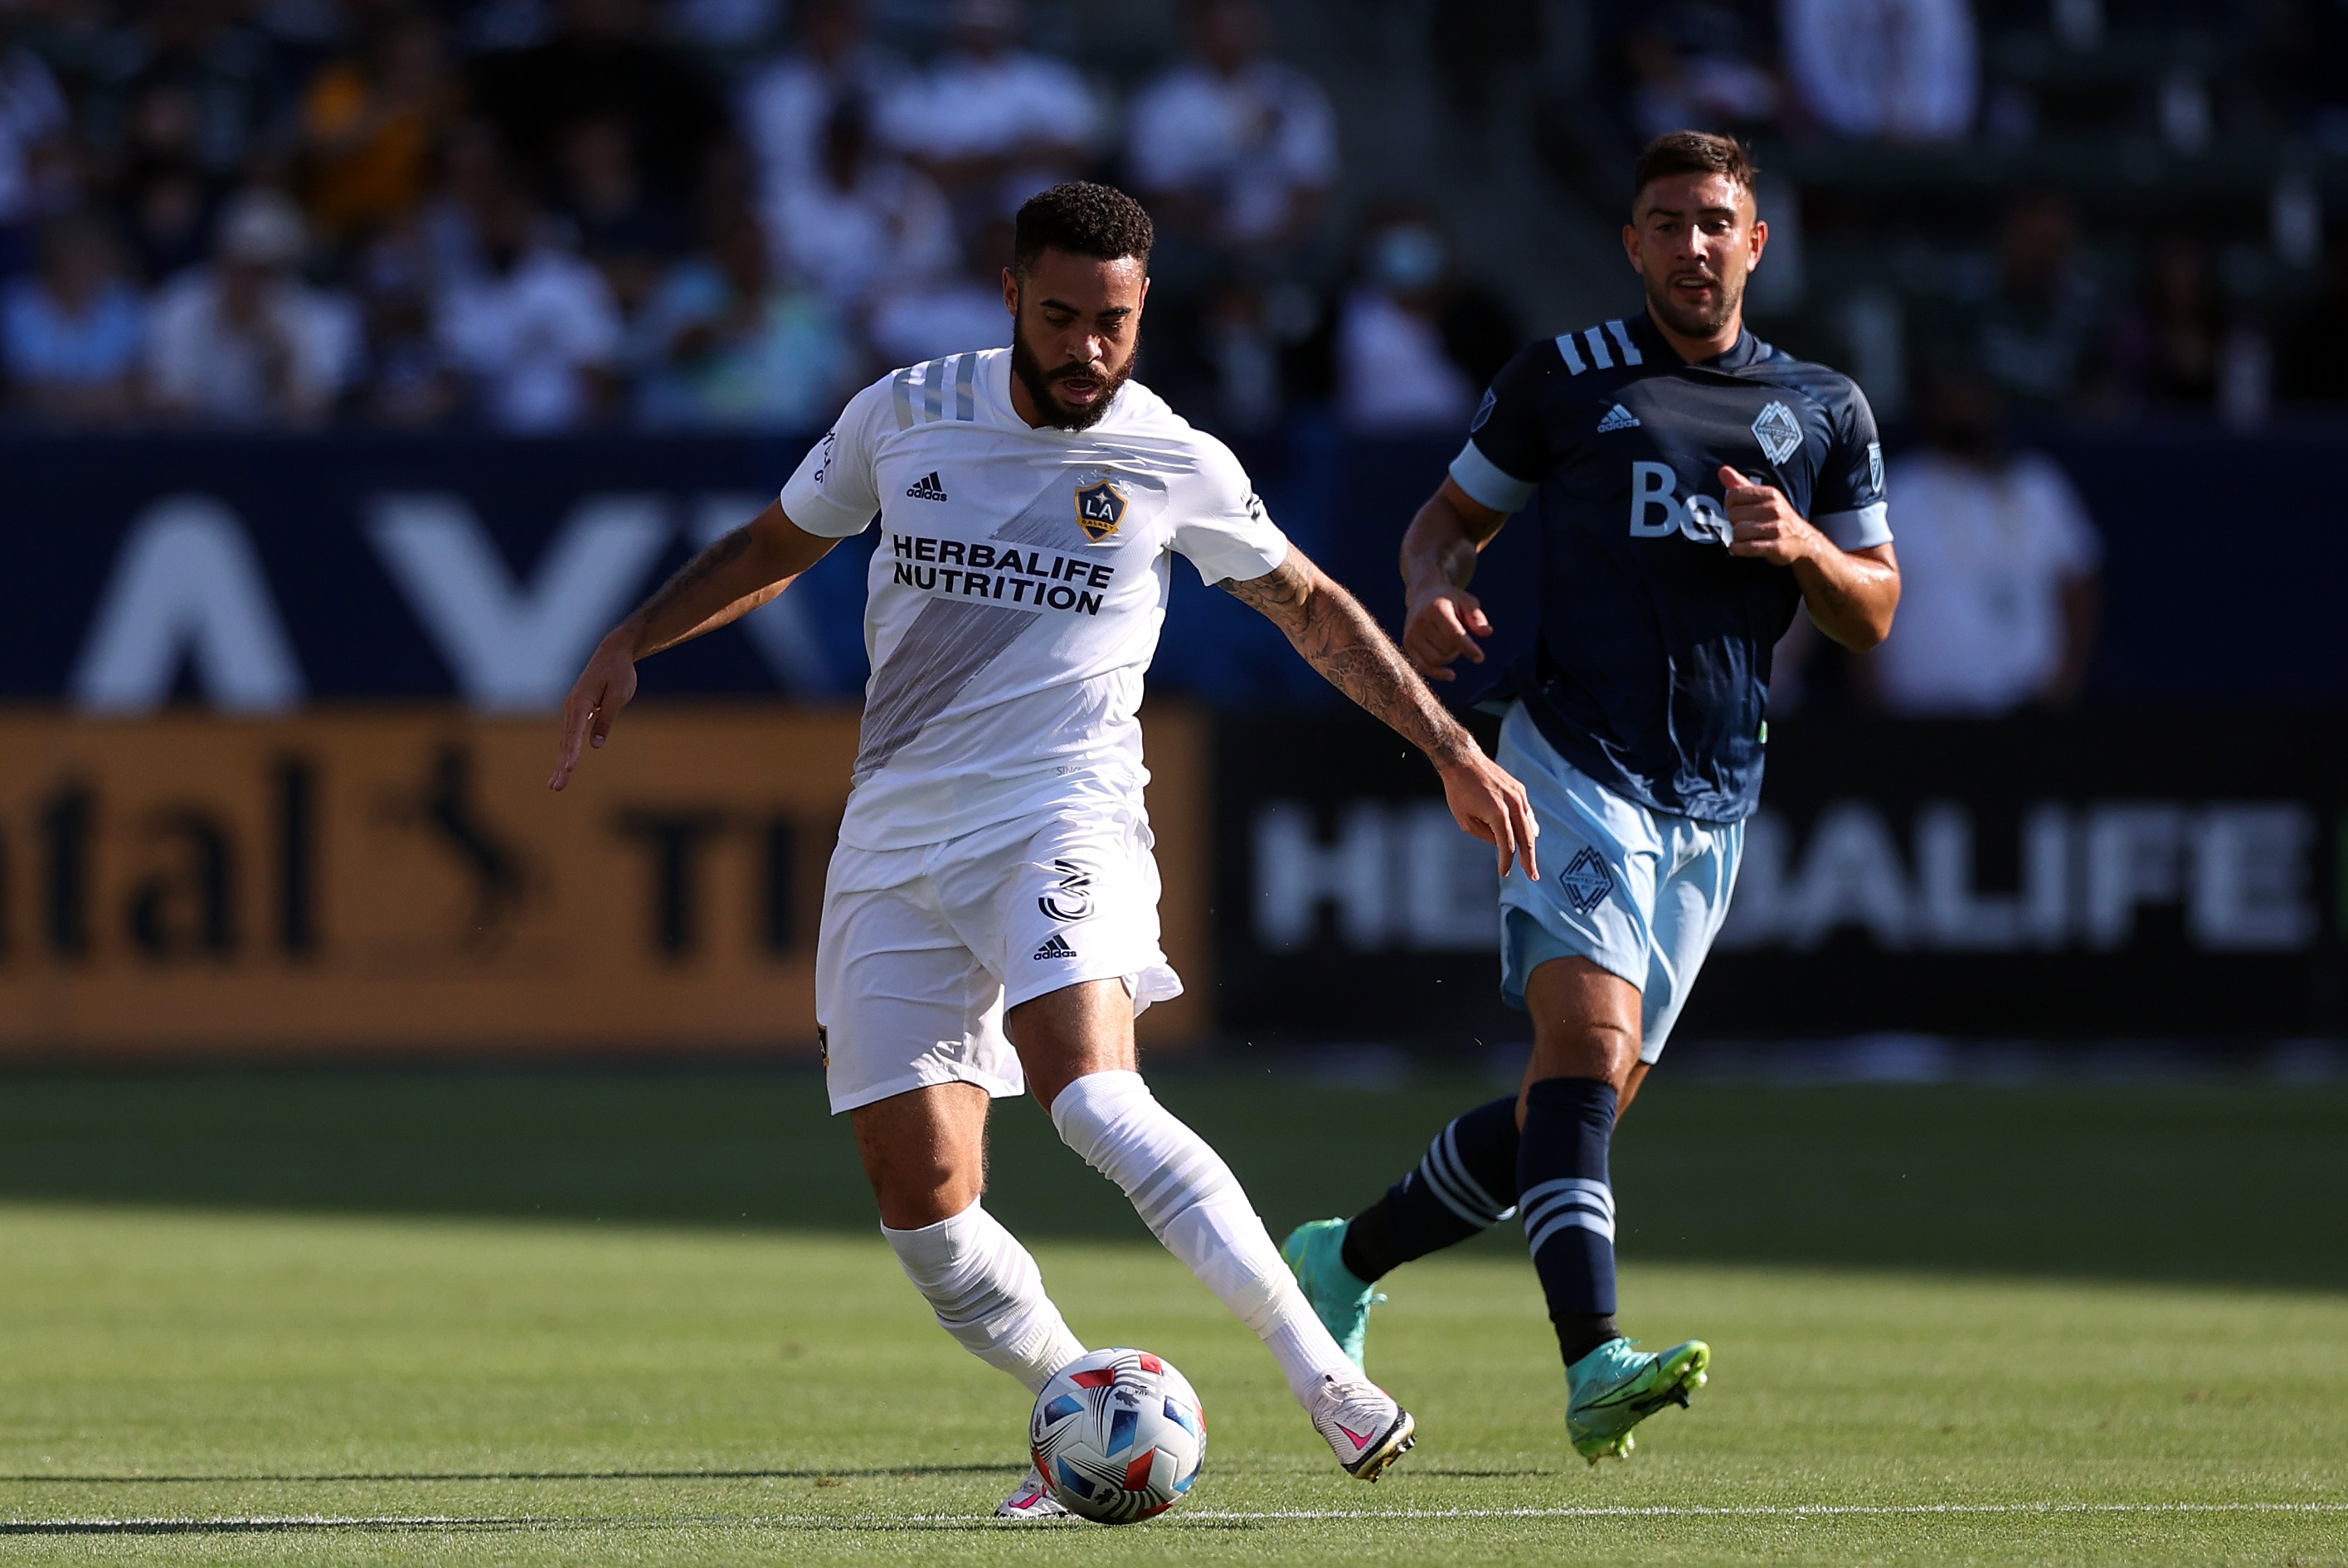 Vancouver Whitecaps FC v Los Angeles Galaxy